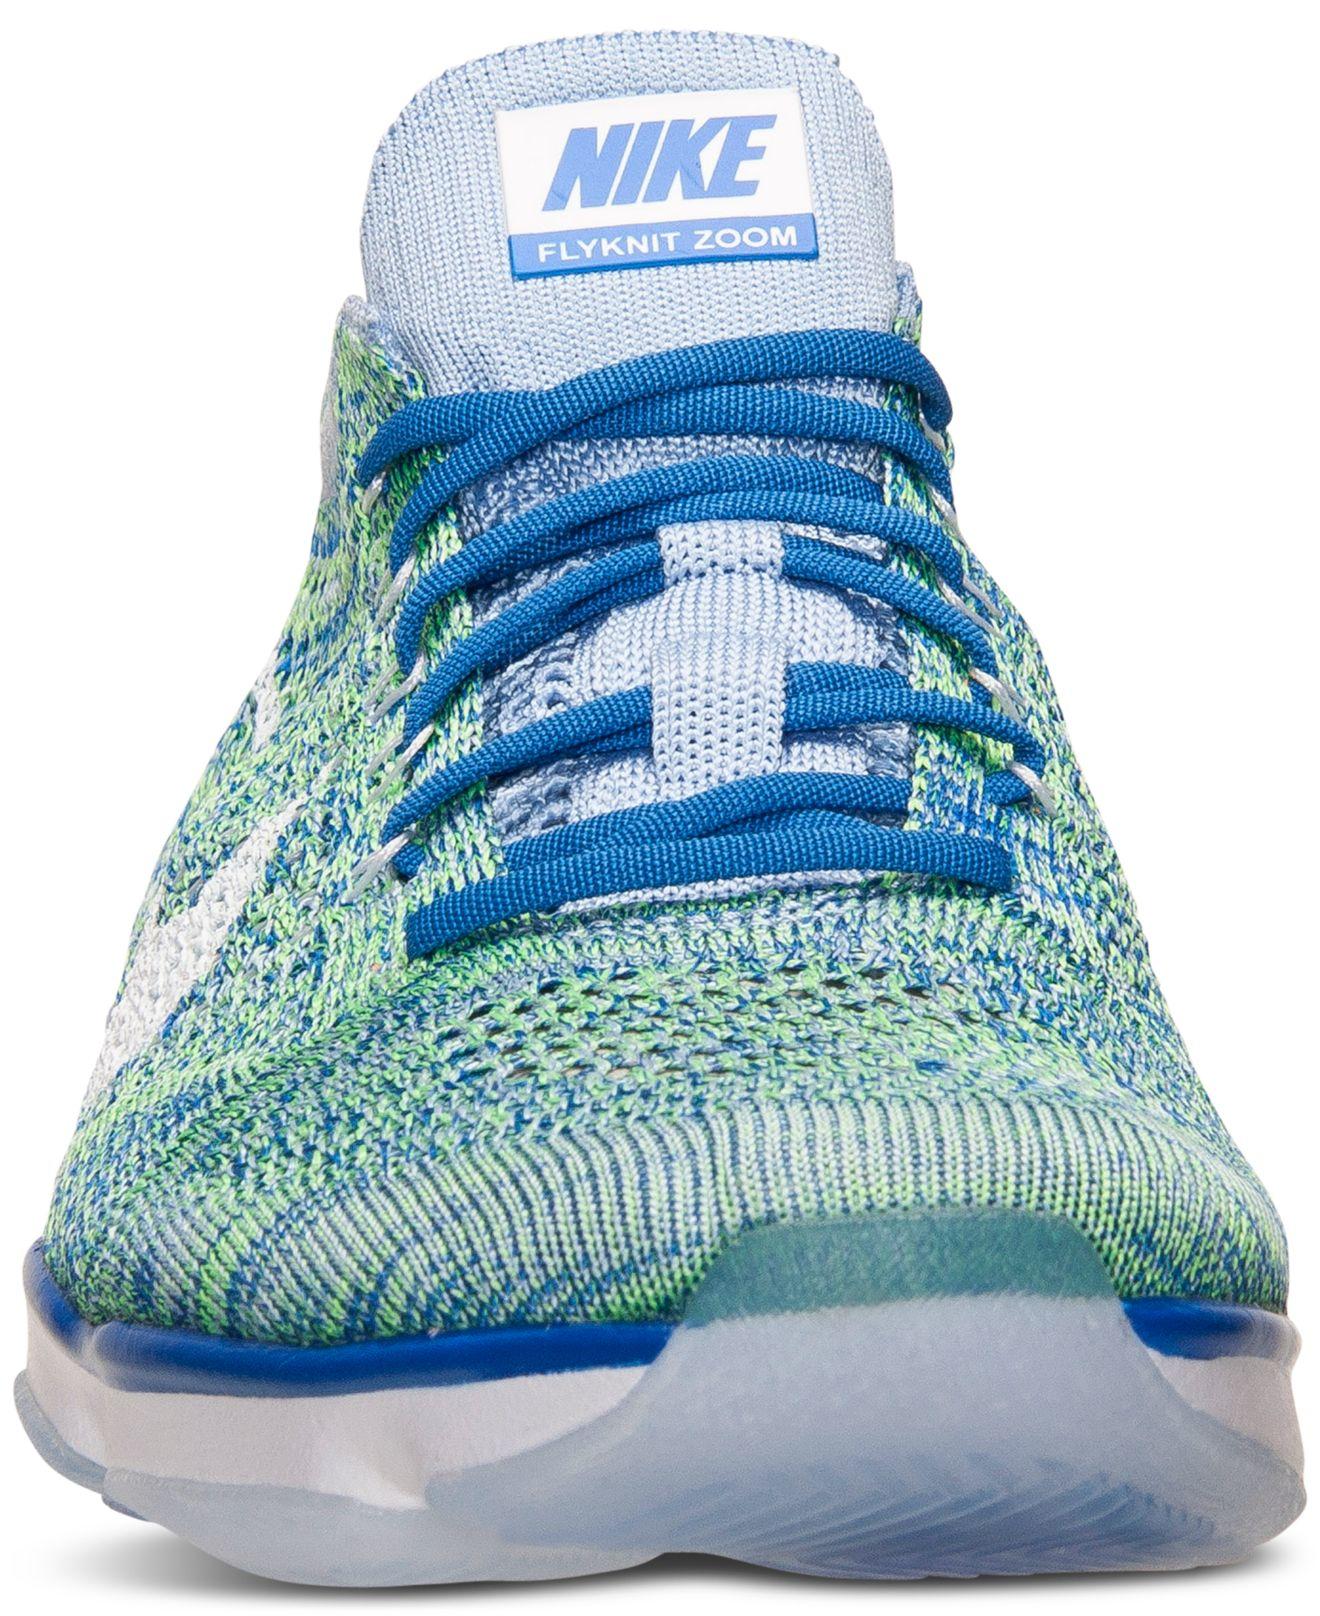 10a87aea2116 Lyst - Nike Women s Flyknit Zoom Agility Training Sneakers From Finish Line  in Blue